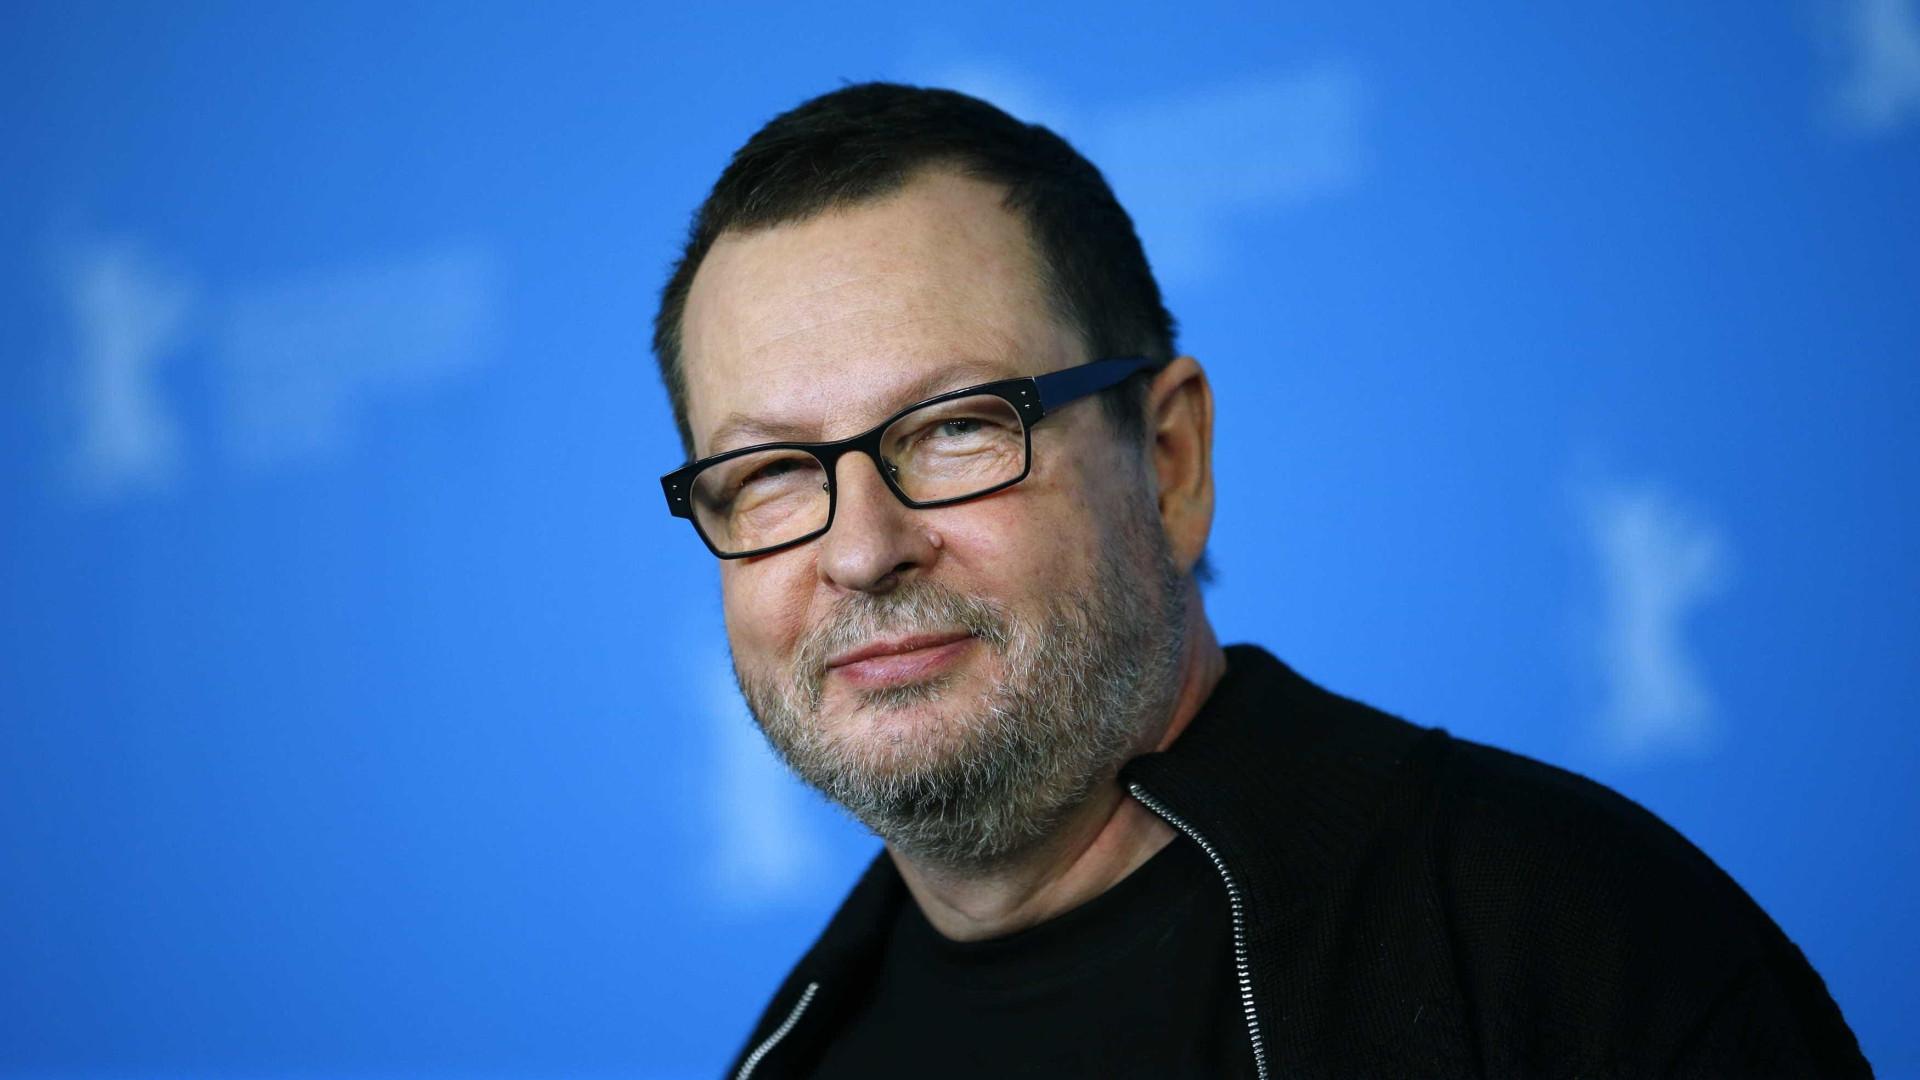 Lars Von Trier volta ao Festival de Cannes após banimento